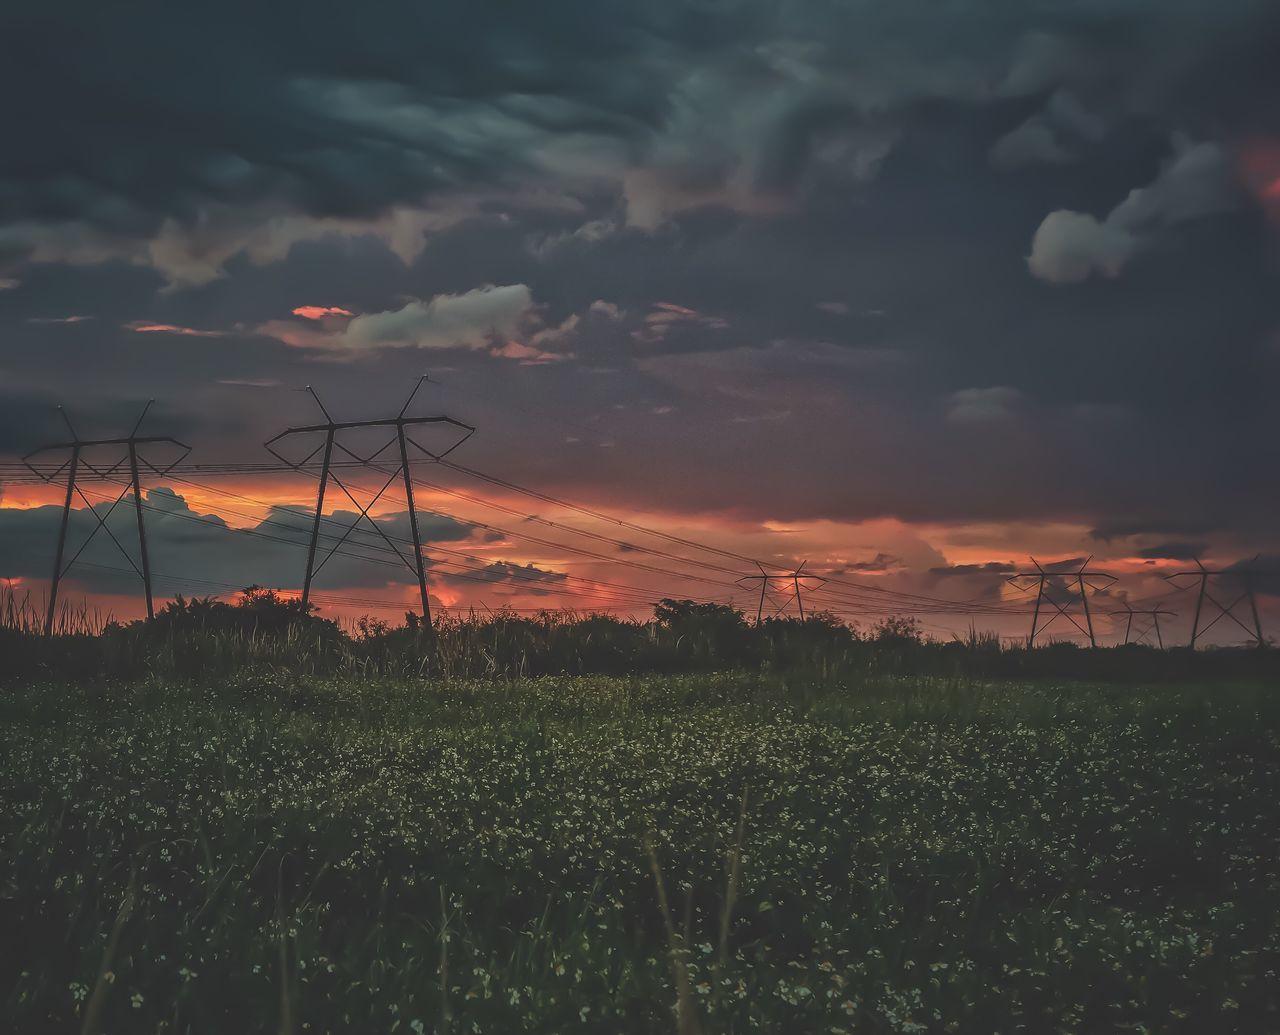 Sunset Beauty In Nature Nature Sky Rural Scene Field Orange Color Growth Scenics Dusk Alternative Energy No People Wind Turbine Tranquil Scene Dramatic Sky Tranquility Outdoors Wind Power Landscape Cloud - Sky